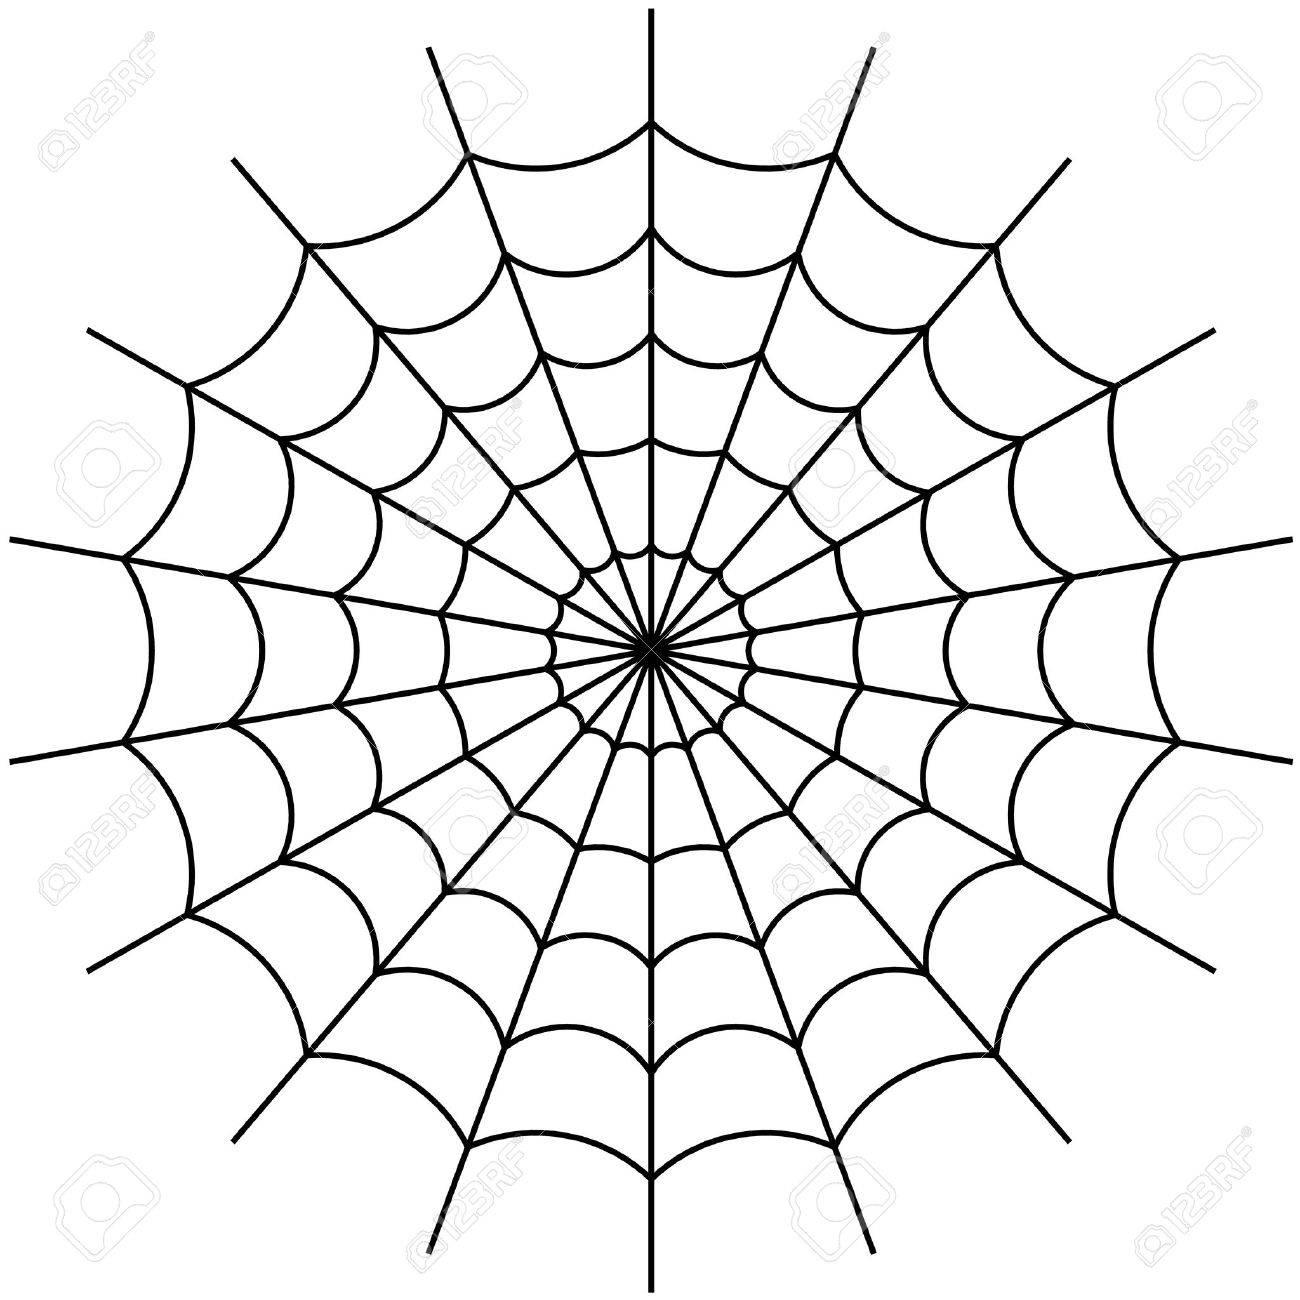 cobweb royalty free cliparts vectors and stock illustration image rh 123rf com cobweb clipart free Black Widow Spider Clip Art